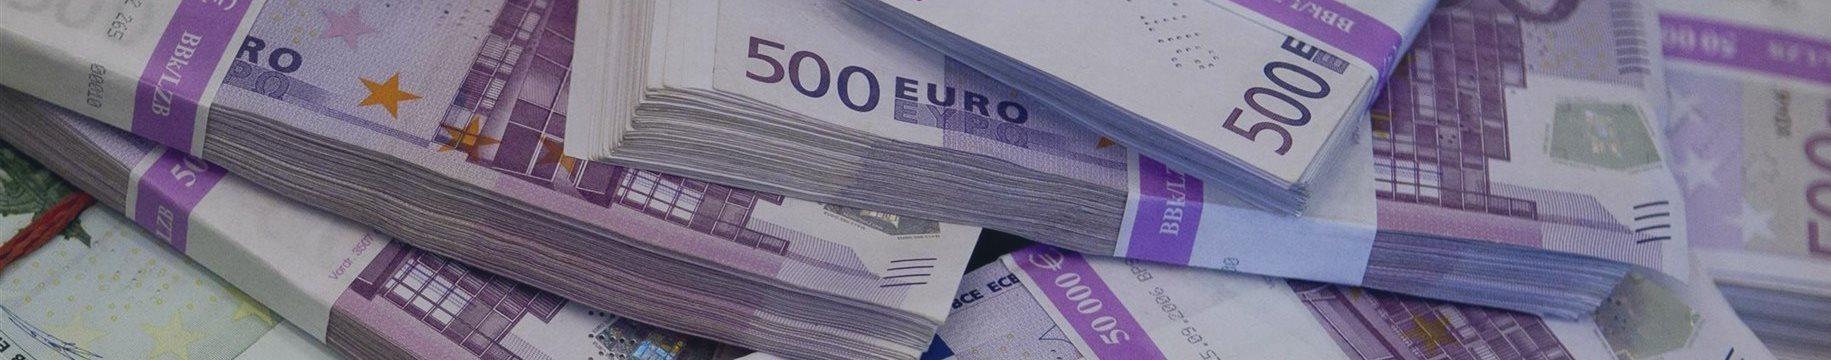 Европа готова дать Греции еще один бридж-кредит на €6 млрд